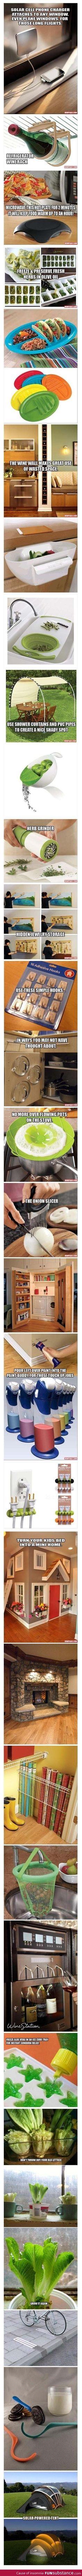 Amazing ideas of awesome